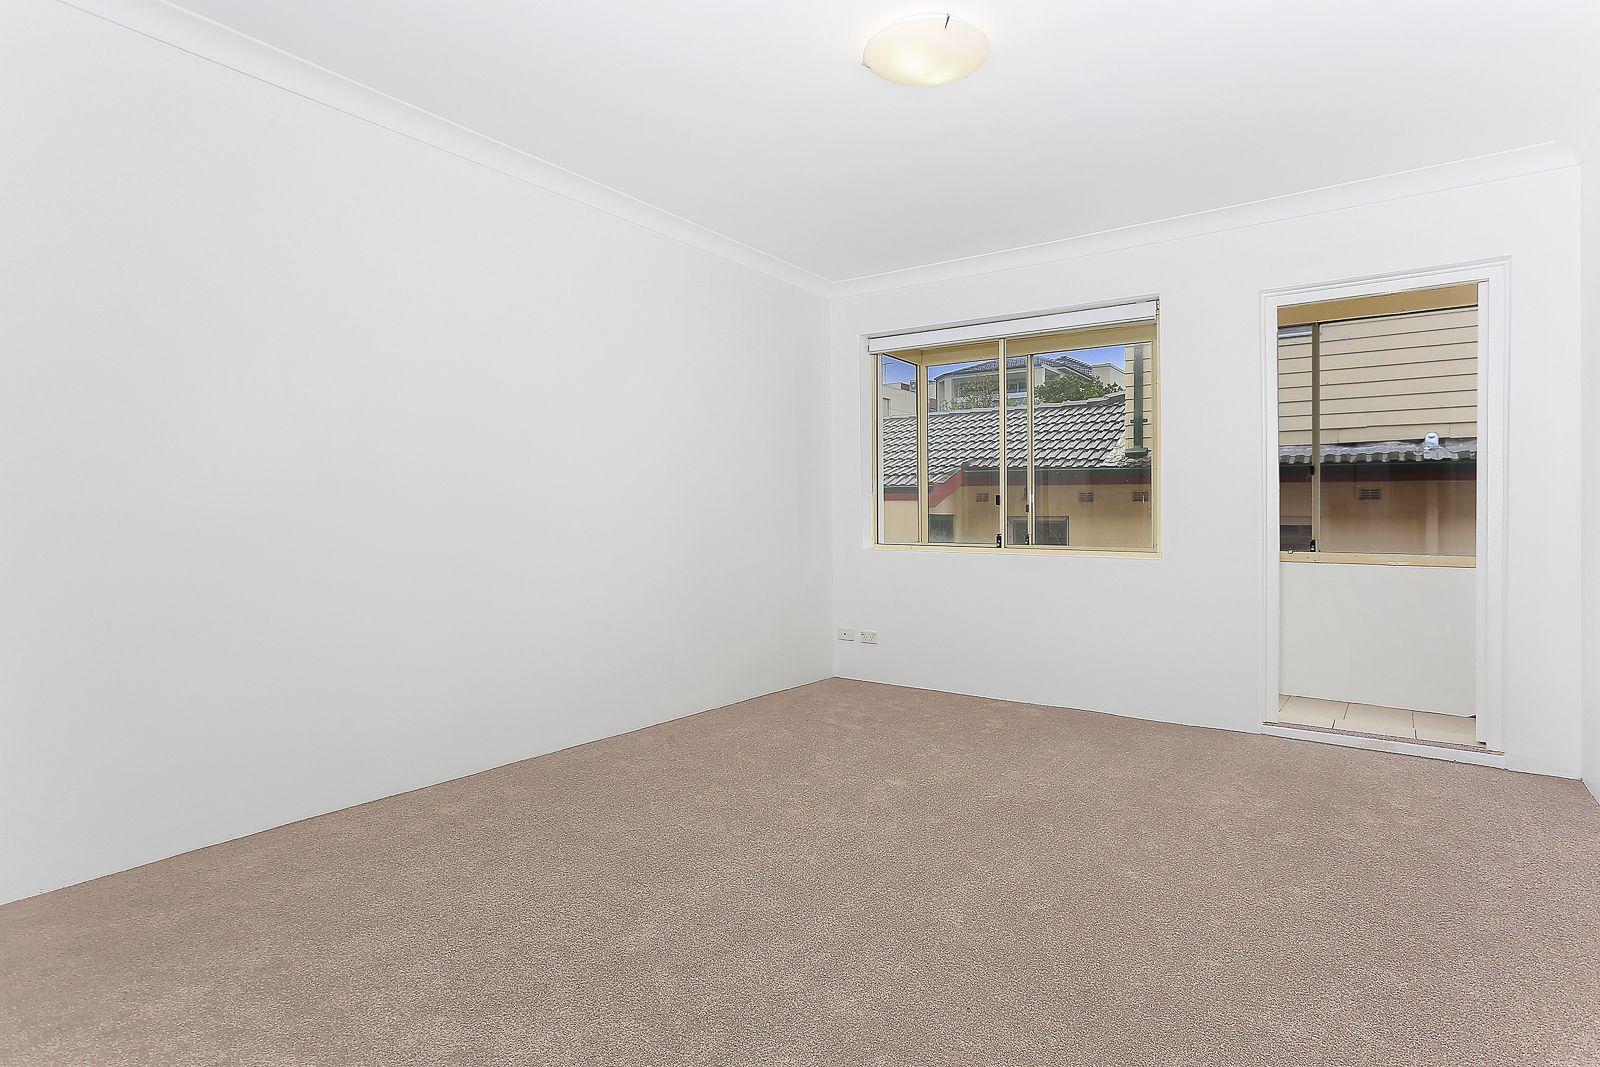 2/8 Beaumond Avenue, Maroubra NSW 2035, Image 1